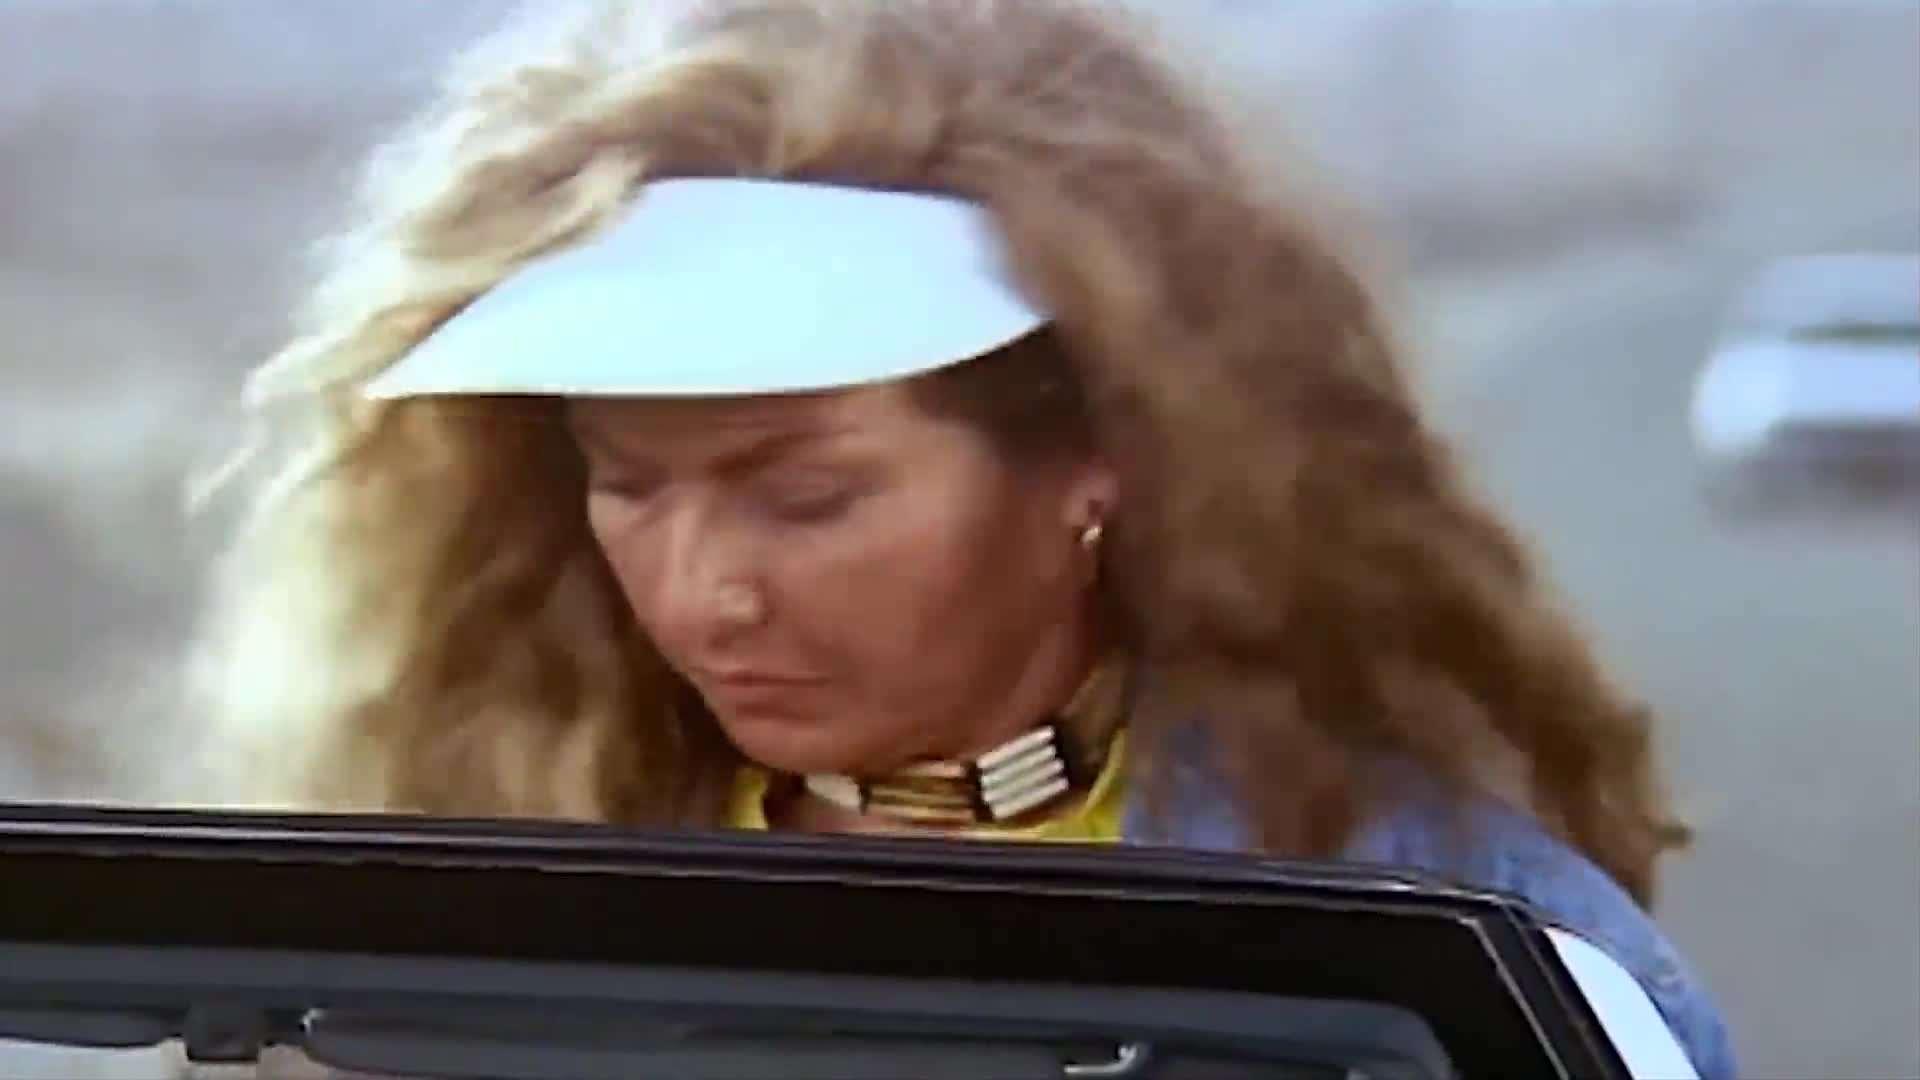 [فيلم][تورنت][تحميل][استاكوزا][1996][1080p][Web-DL] 4 arabp2p.com